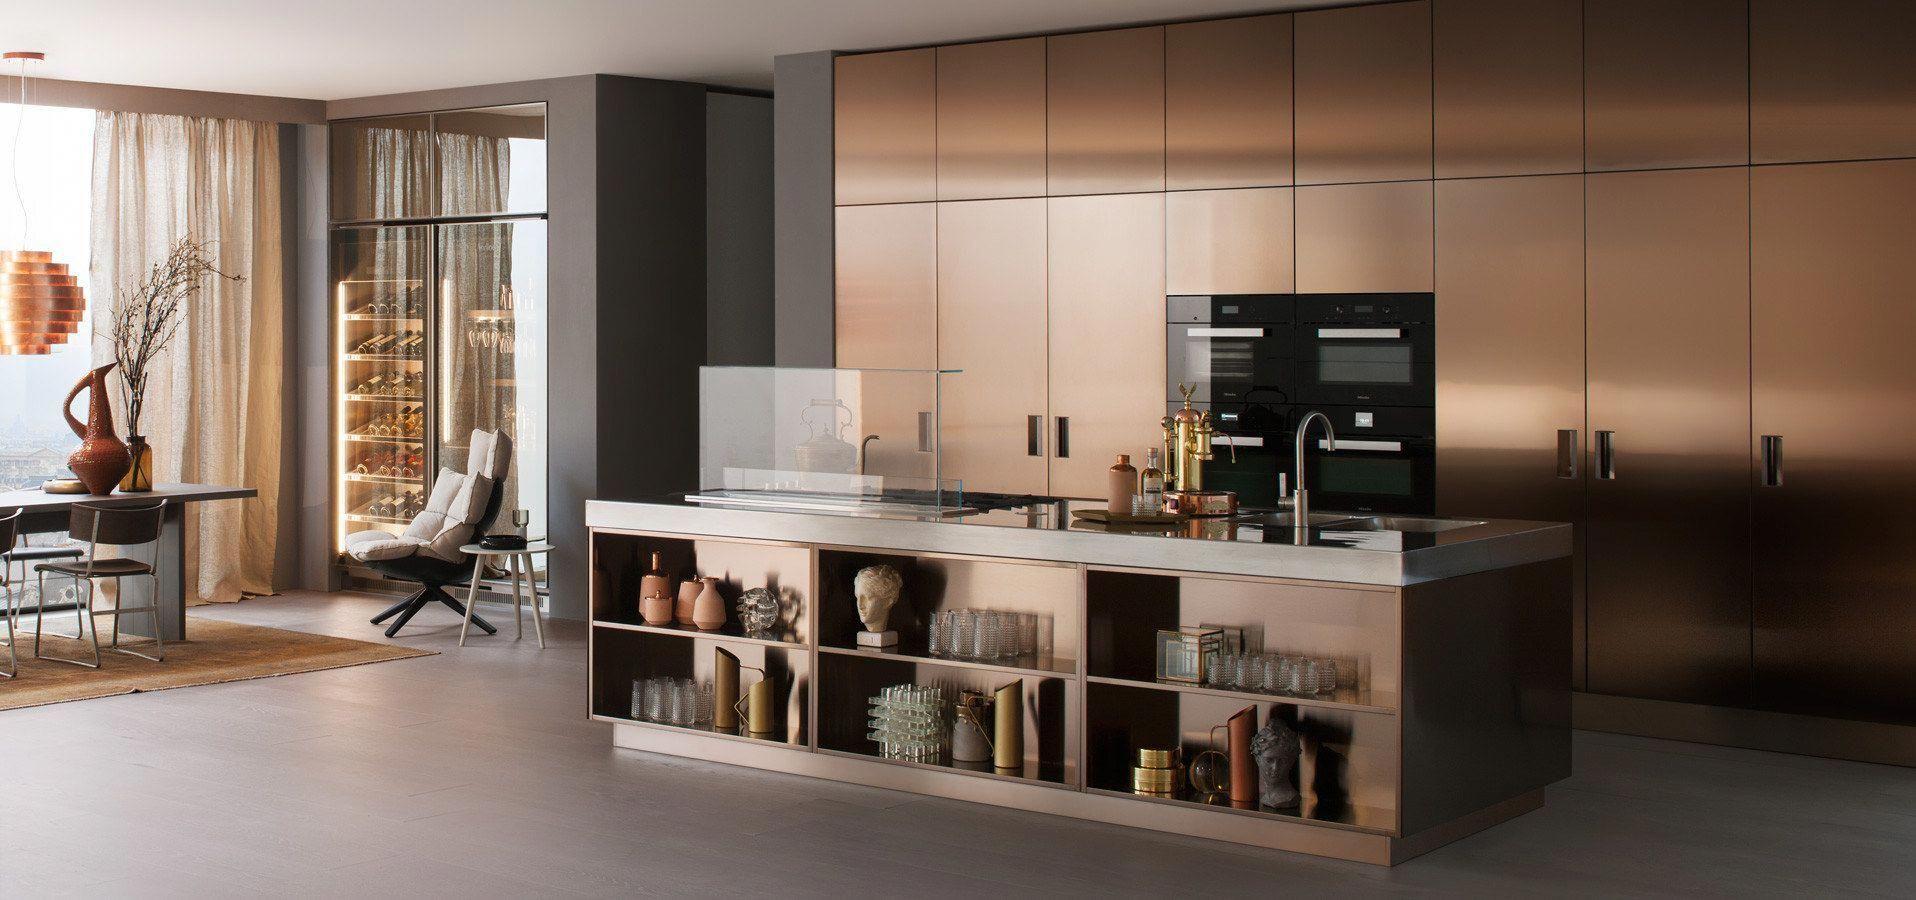 Küchenideen hdb kitchen renovation ideas  luxe readymade kitchens photos